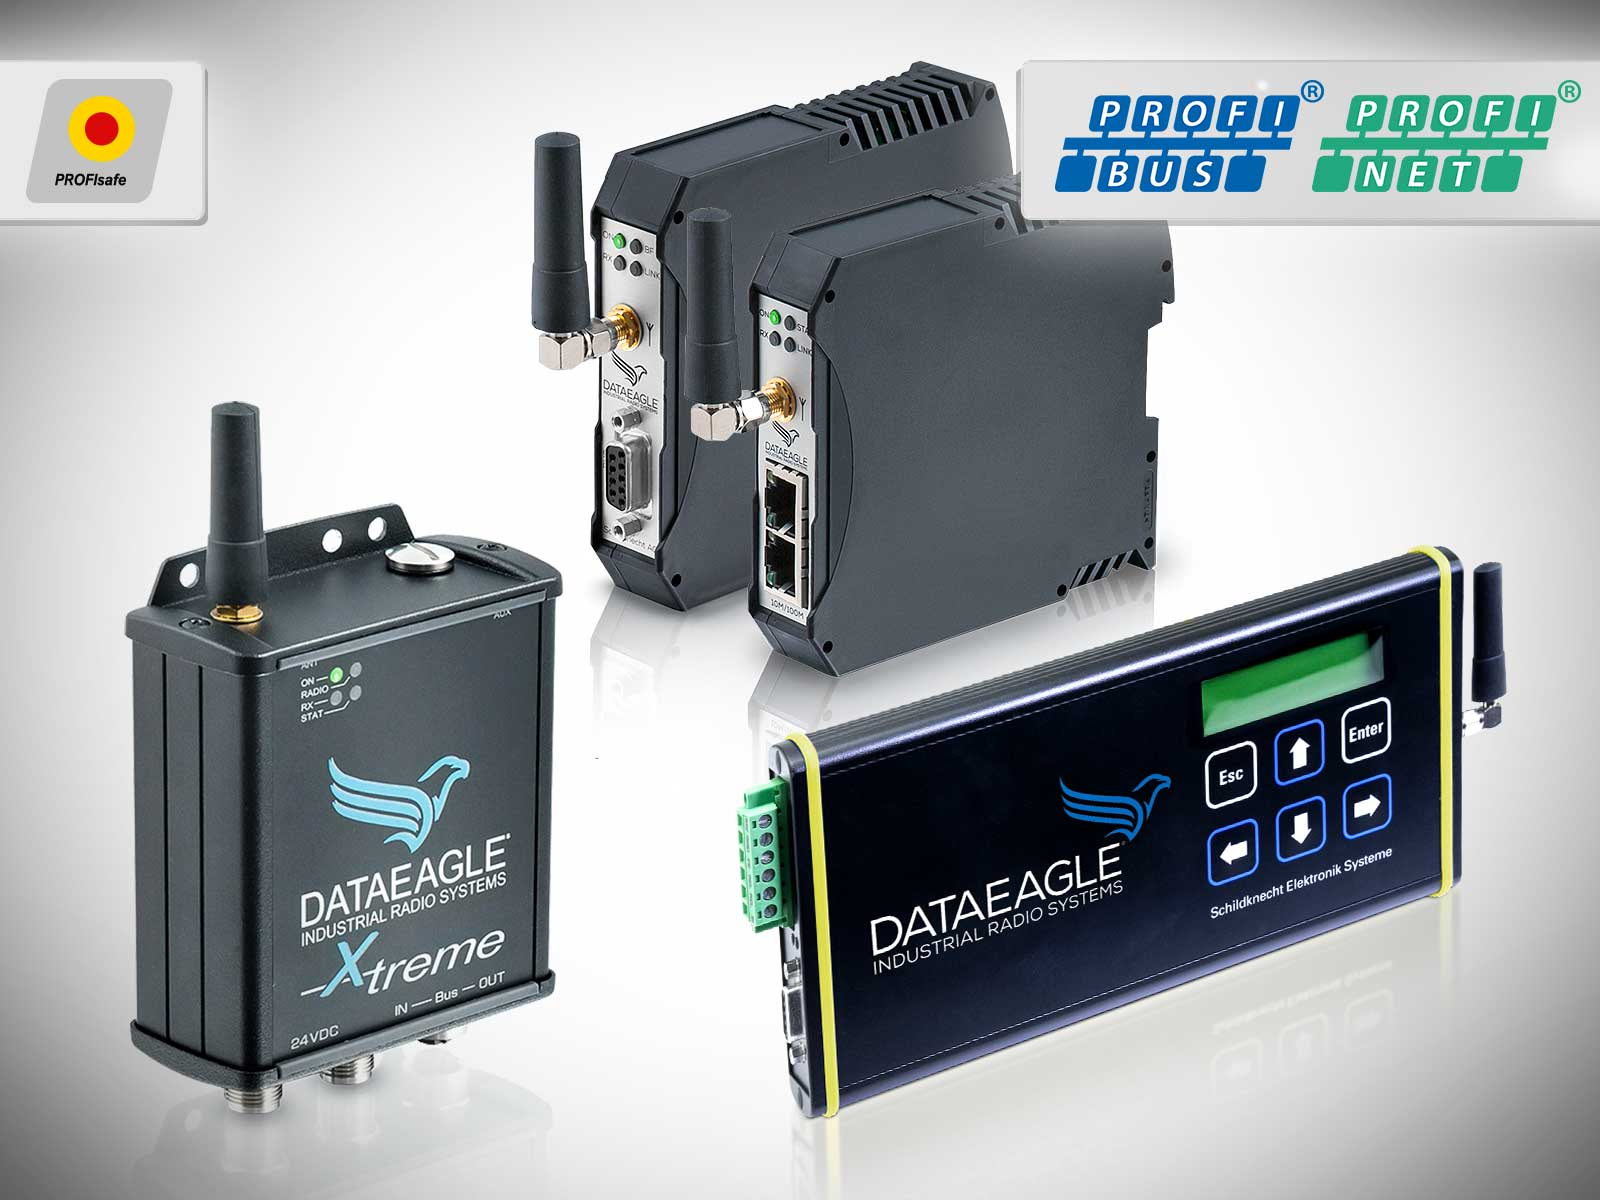 Wireless PROFIsafe • DATAEAGLE 3000/4000